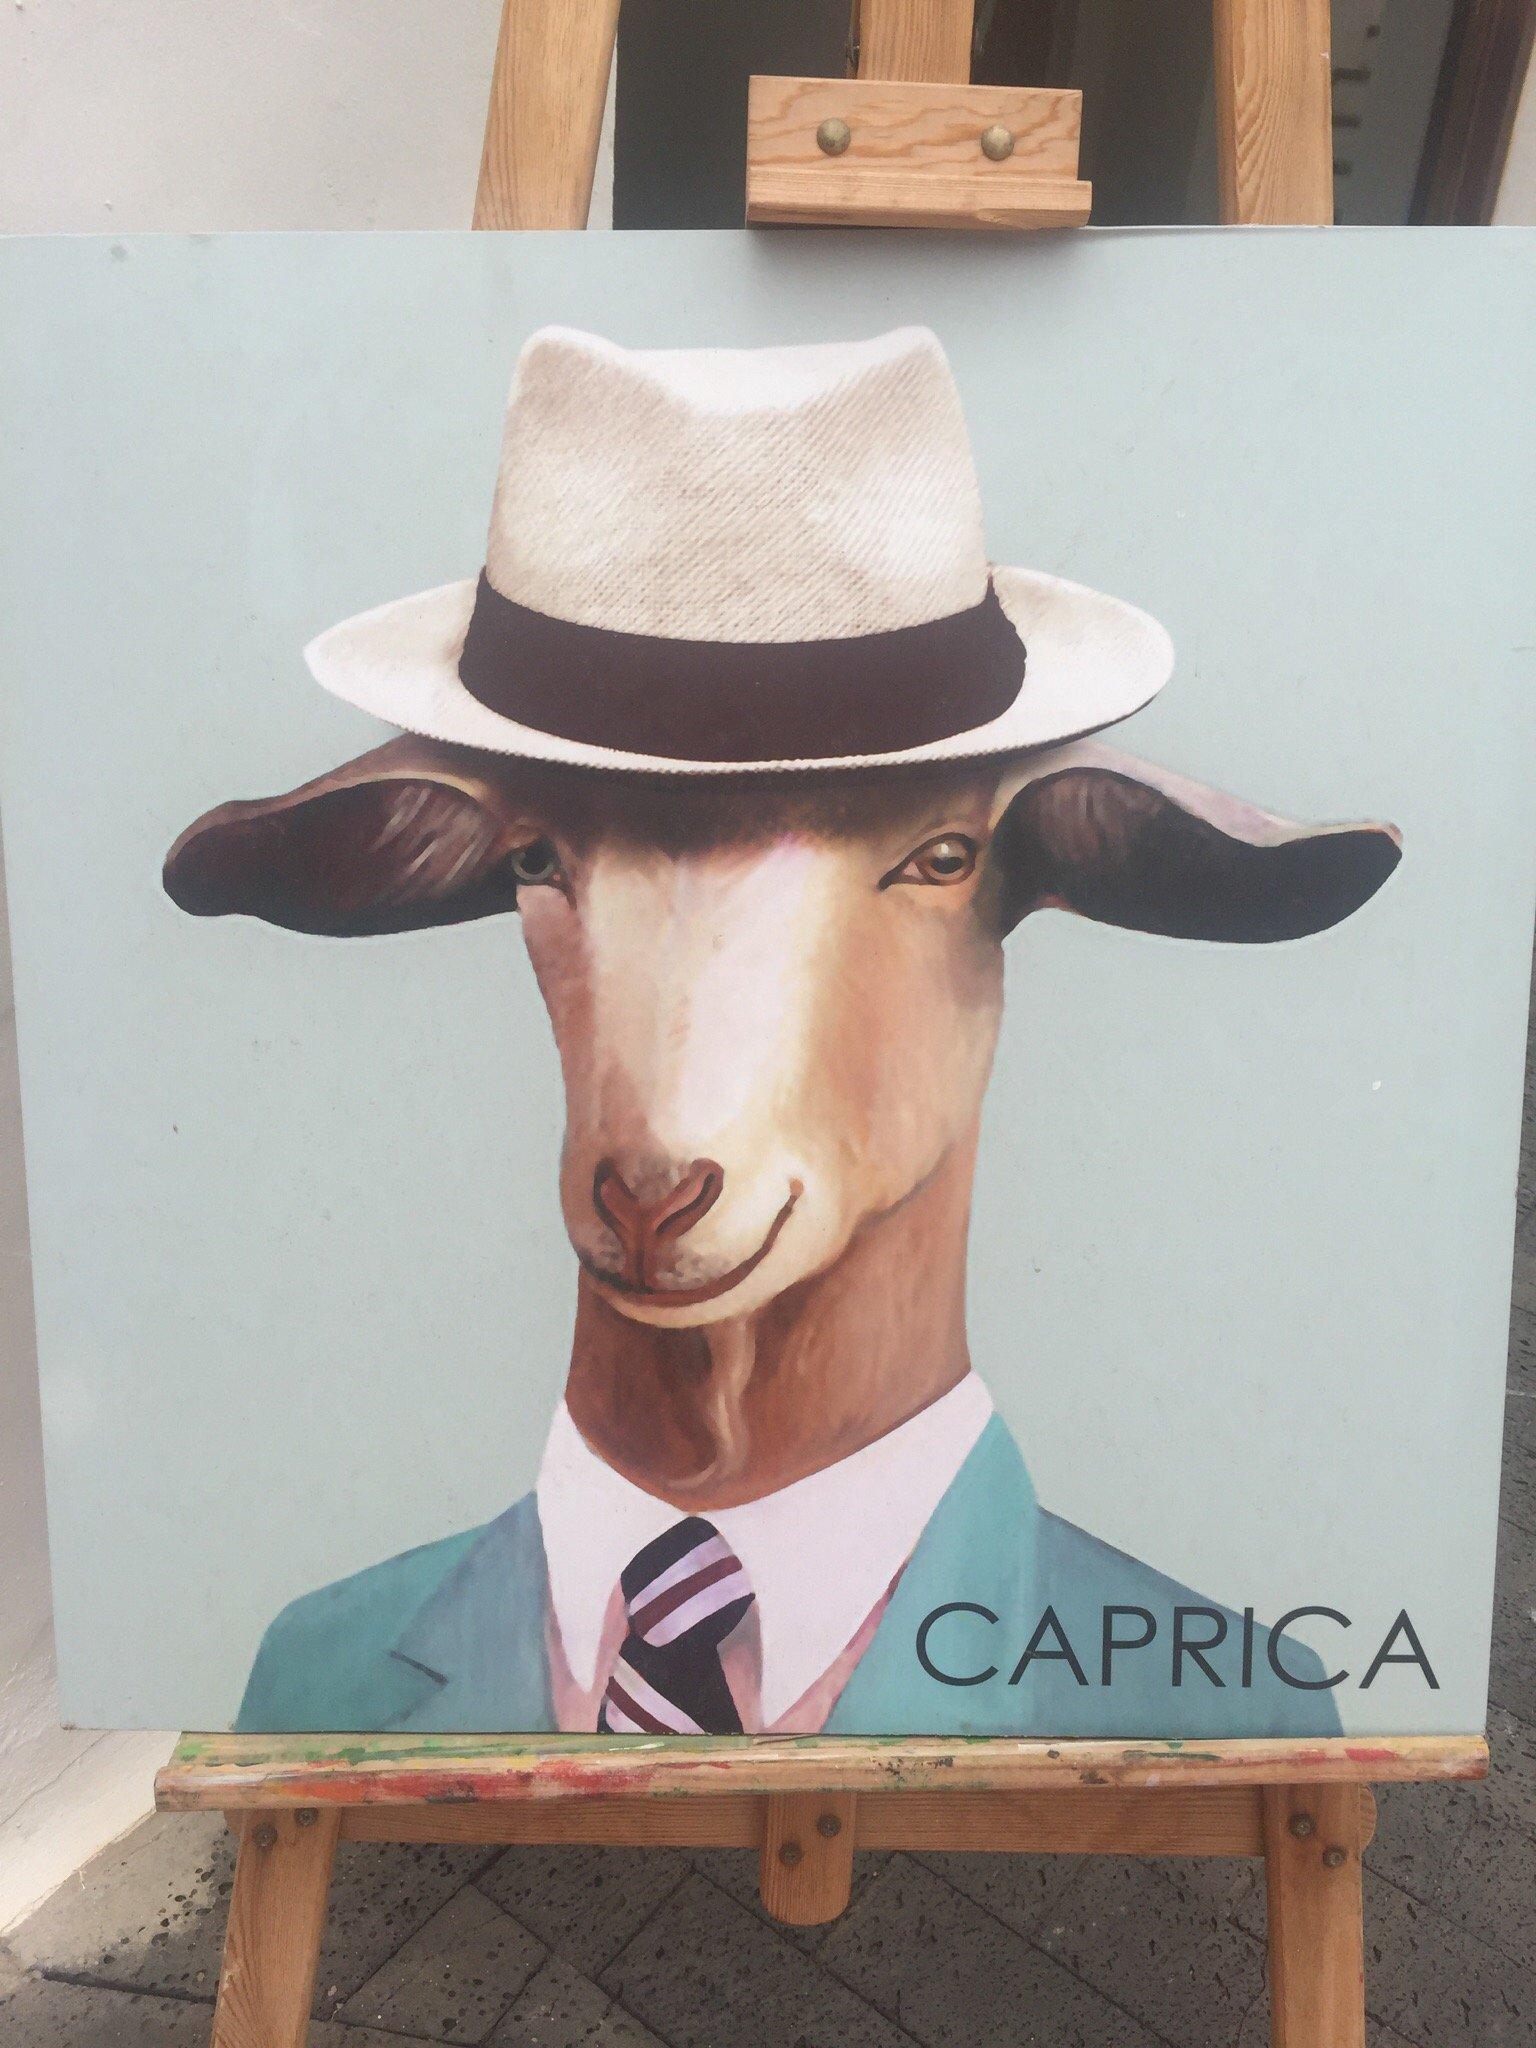 Caprica Cheese The 10 Best Restaurants Near